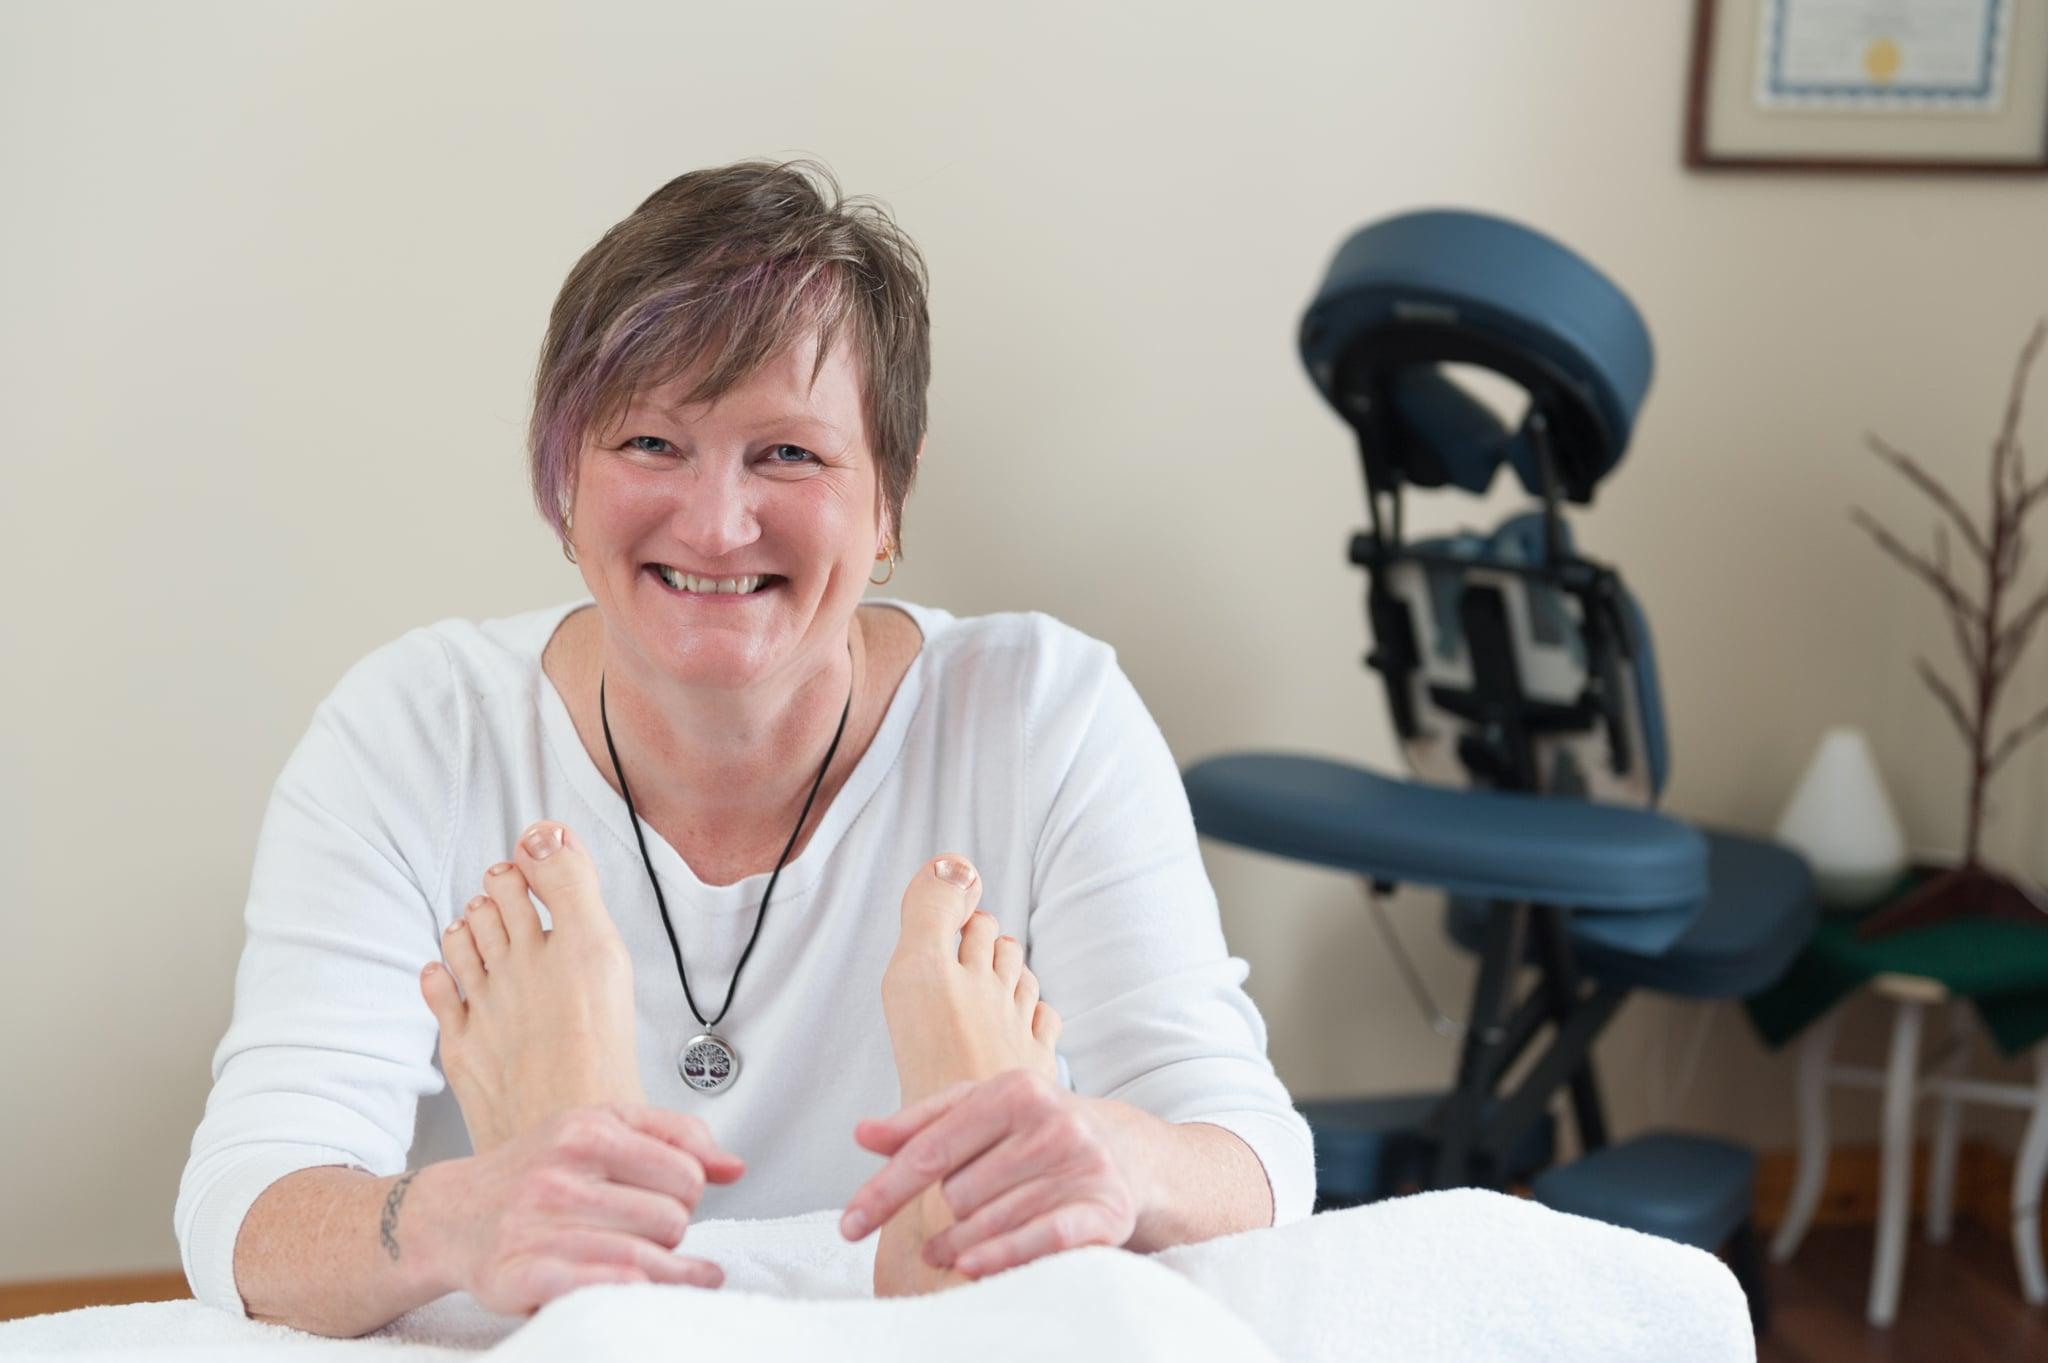 PEI Reflexologist Deborah Walsh